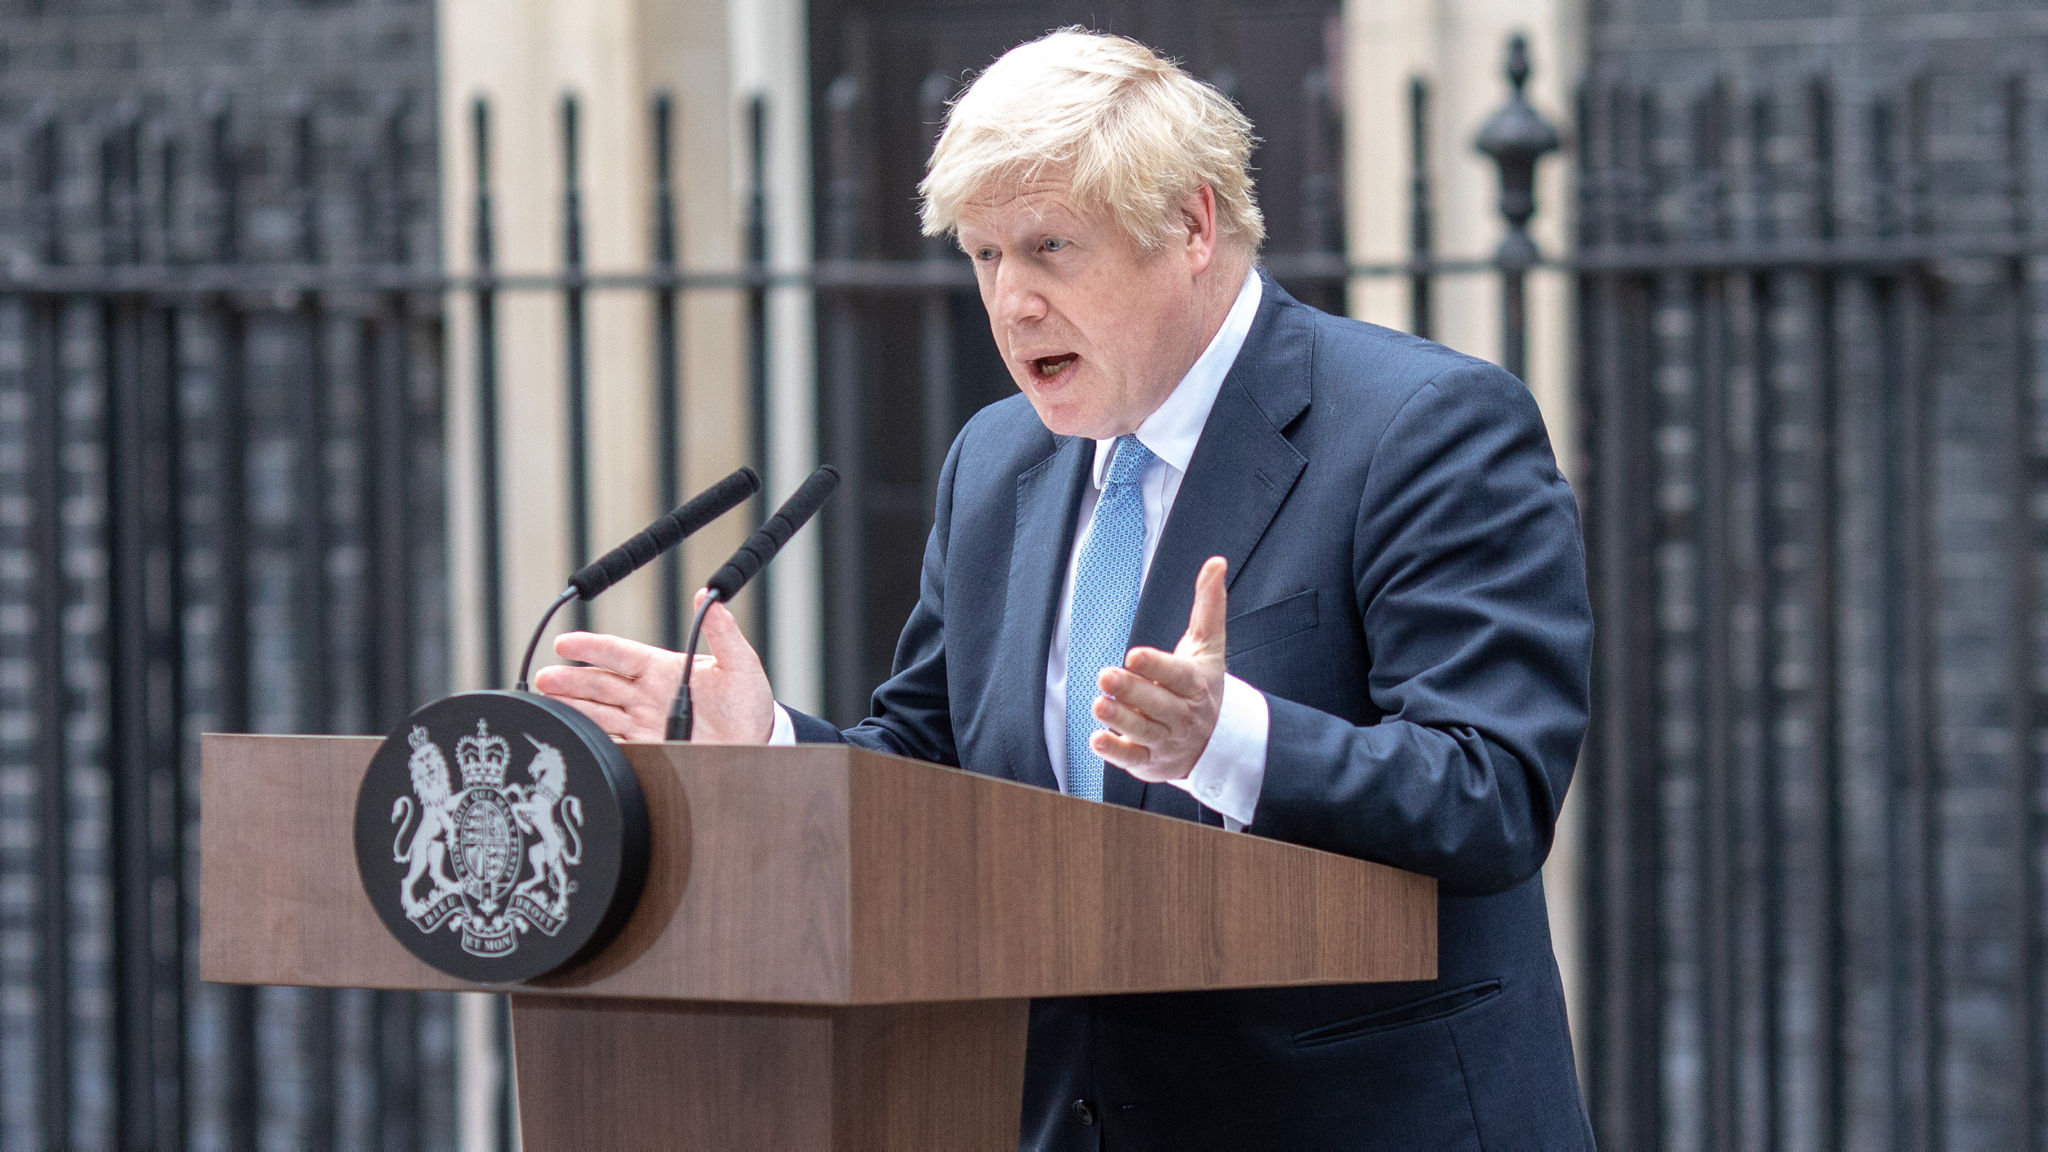 Boris Johnson threatens to call October 14 general election